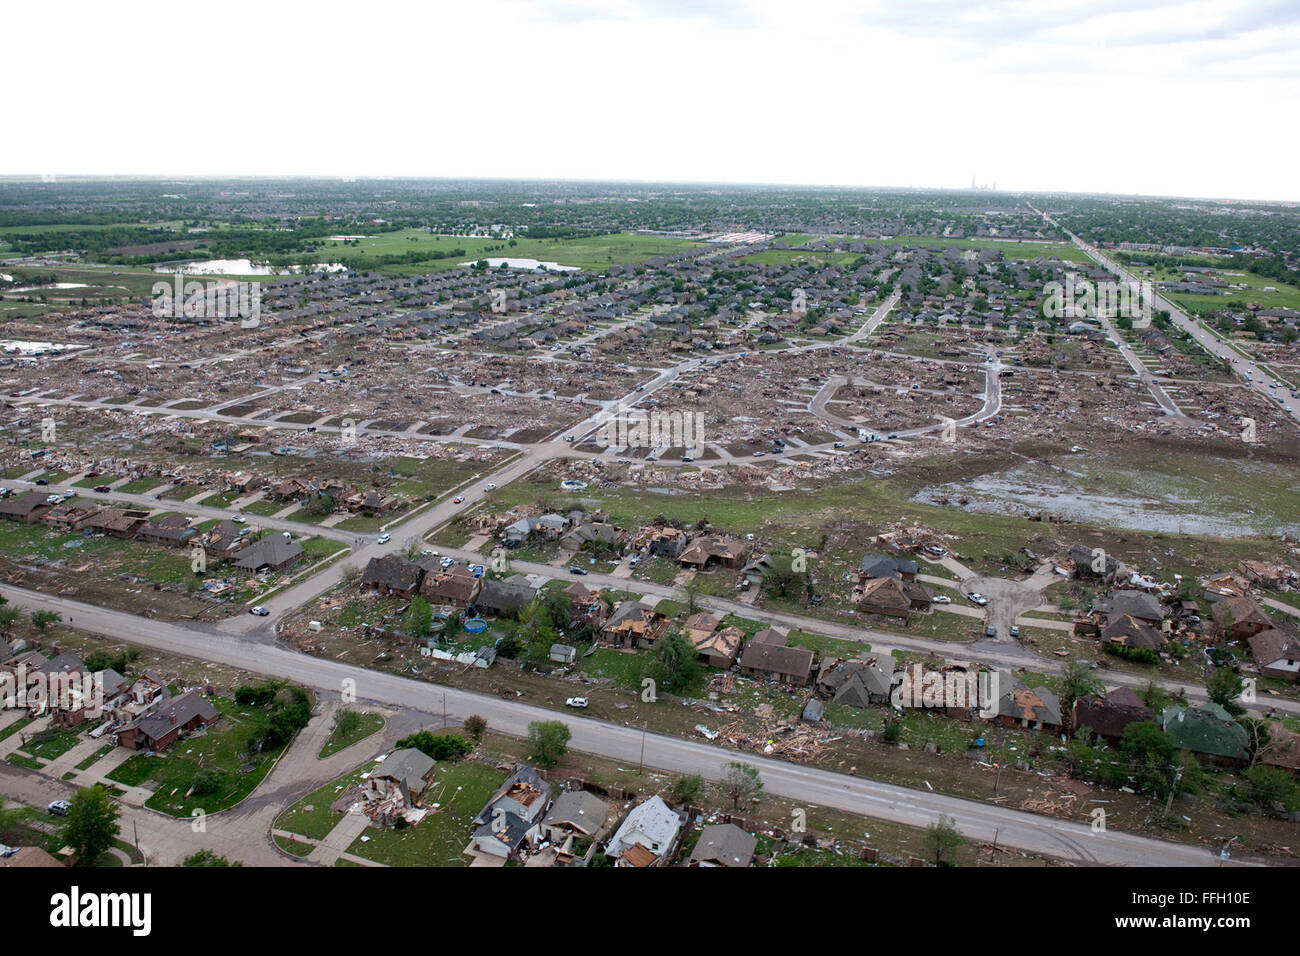 Flyover of tornado damage from the May 20 tornado in Moore, Okla. - Stock Image